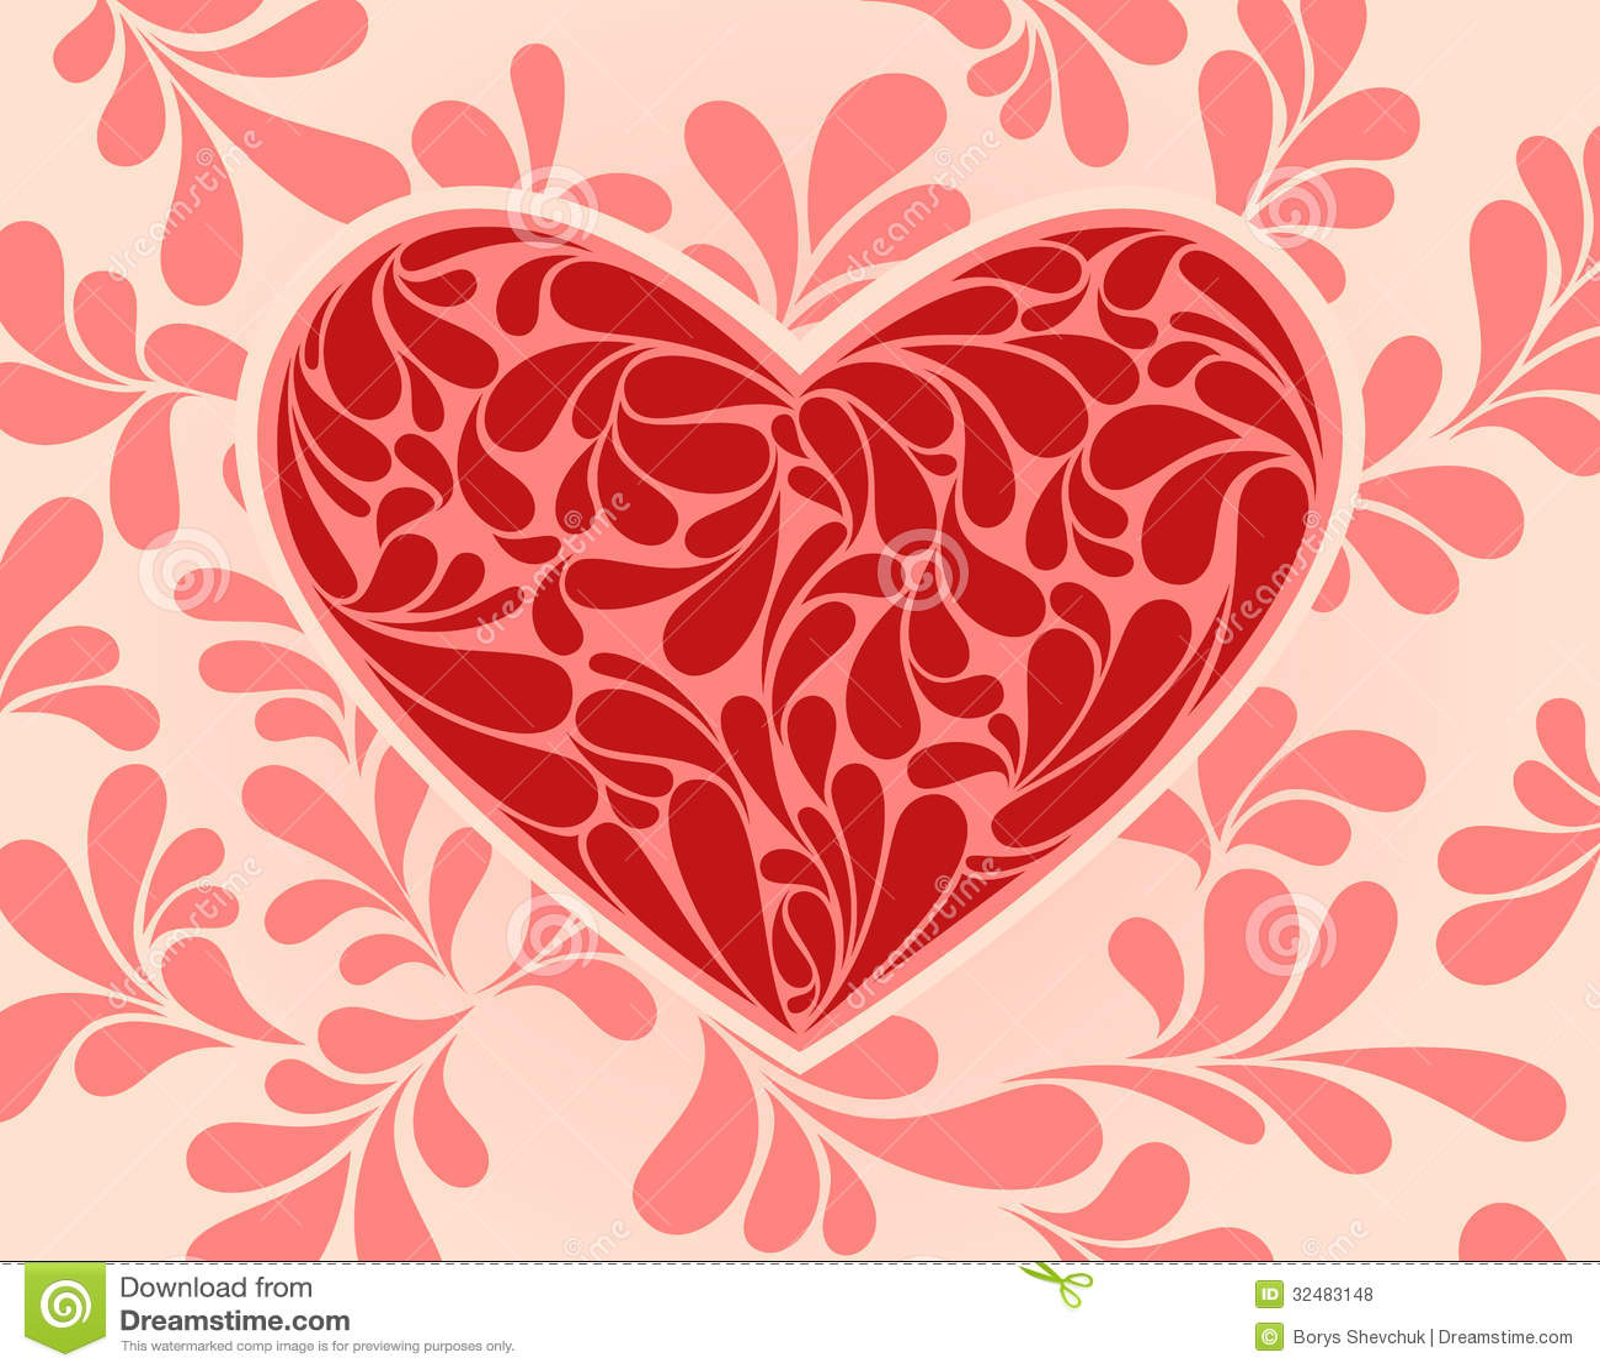 Wedding Heart Design - More information